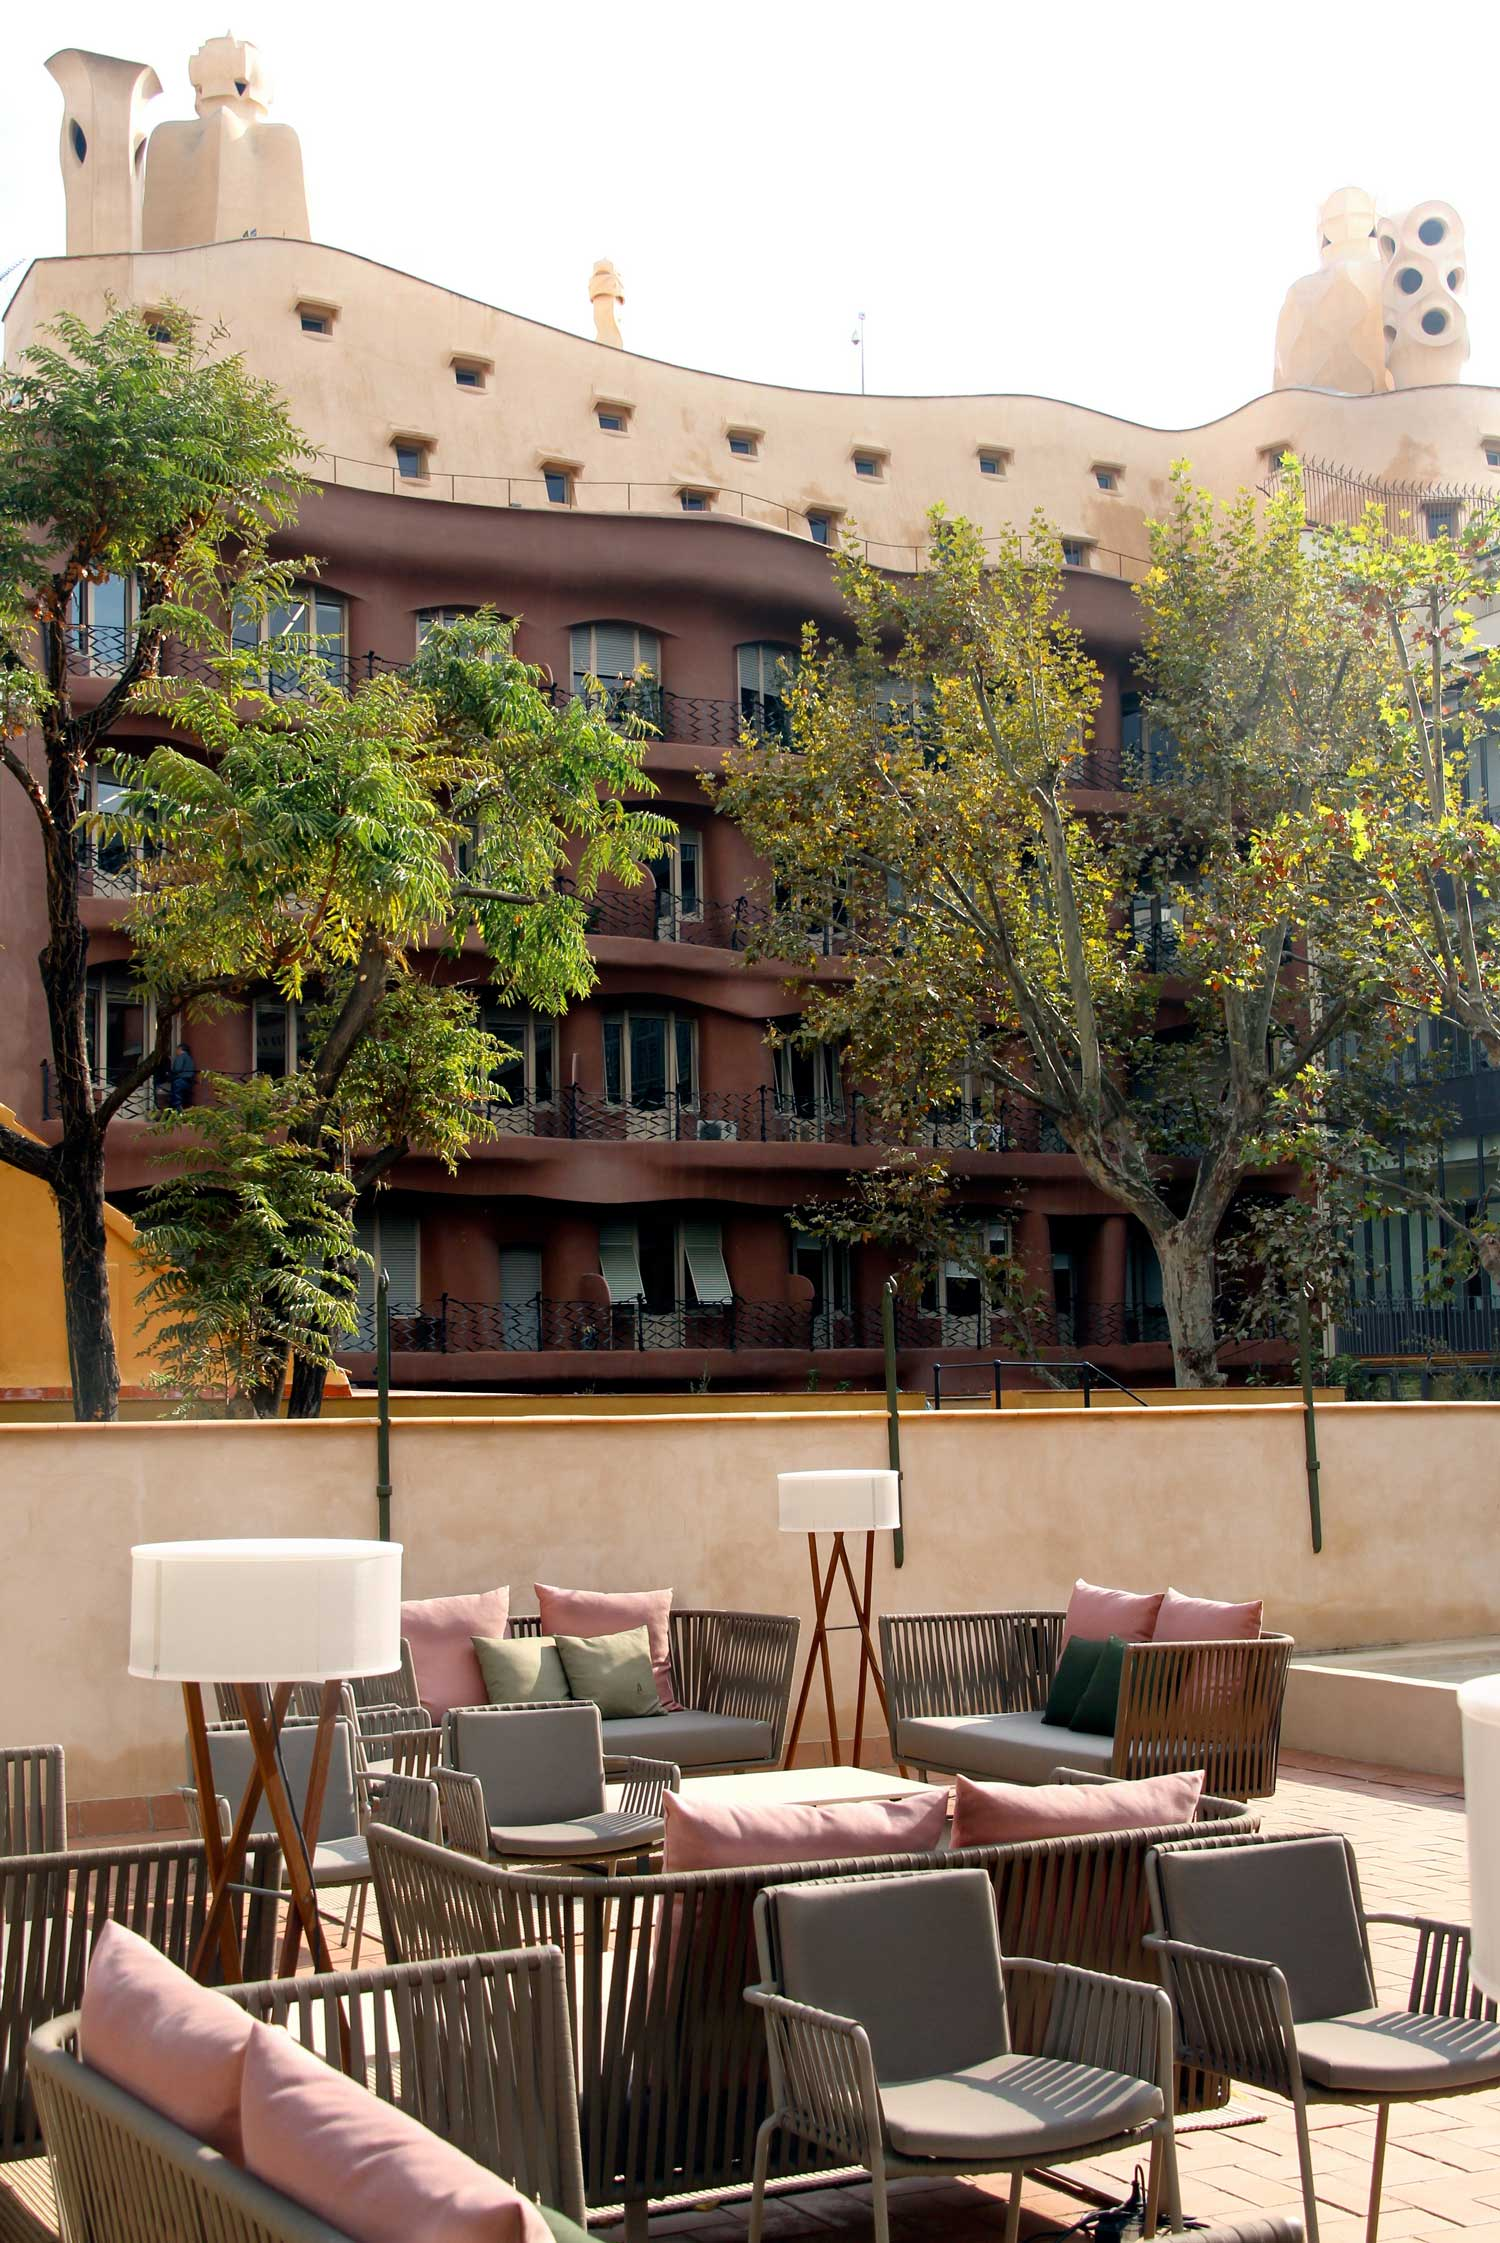 H10 casa mimosa hotel in barcelona by tarruella trenchs - H10 casa mimosa ...